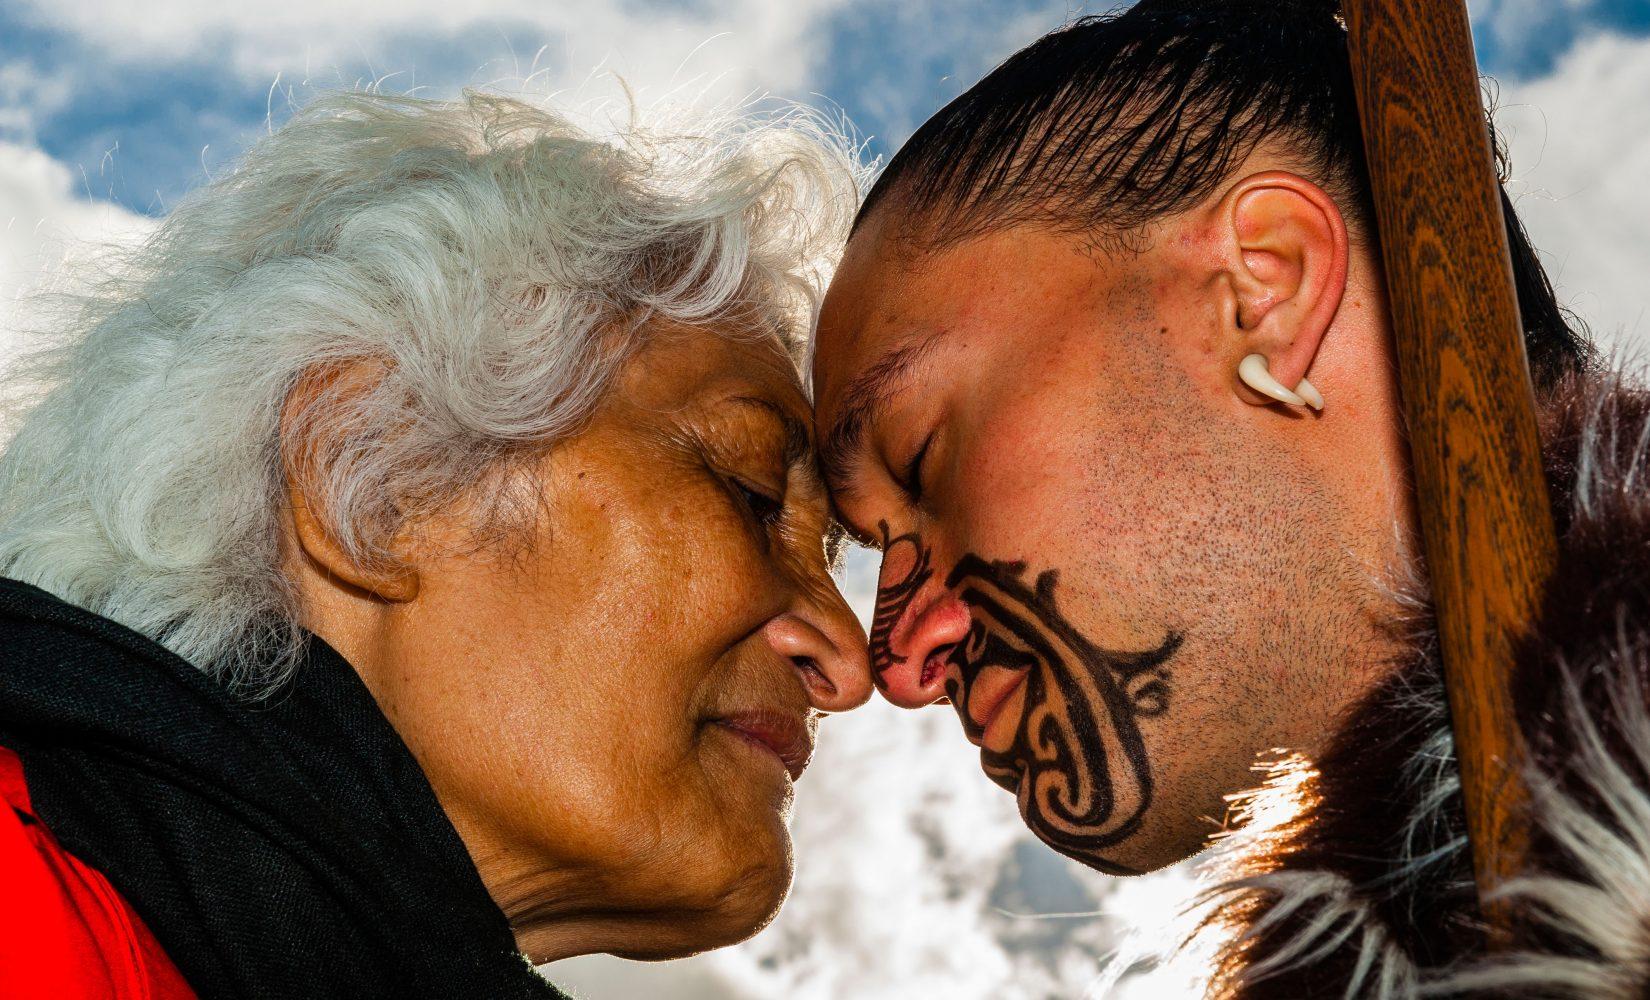 D72CNG A Maori man with ta moko (facial tattoo) and an elderly Maori woman doing hongi (traditional Maori greeting) , Te Puia (New Zealand Maori Arts & Crafts Institute), Rotorua, New Zealand